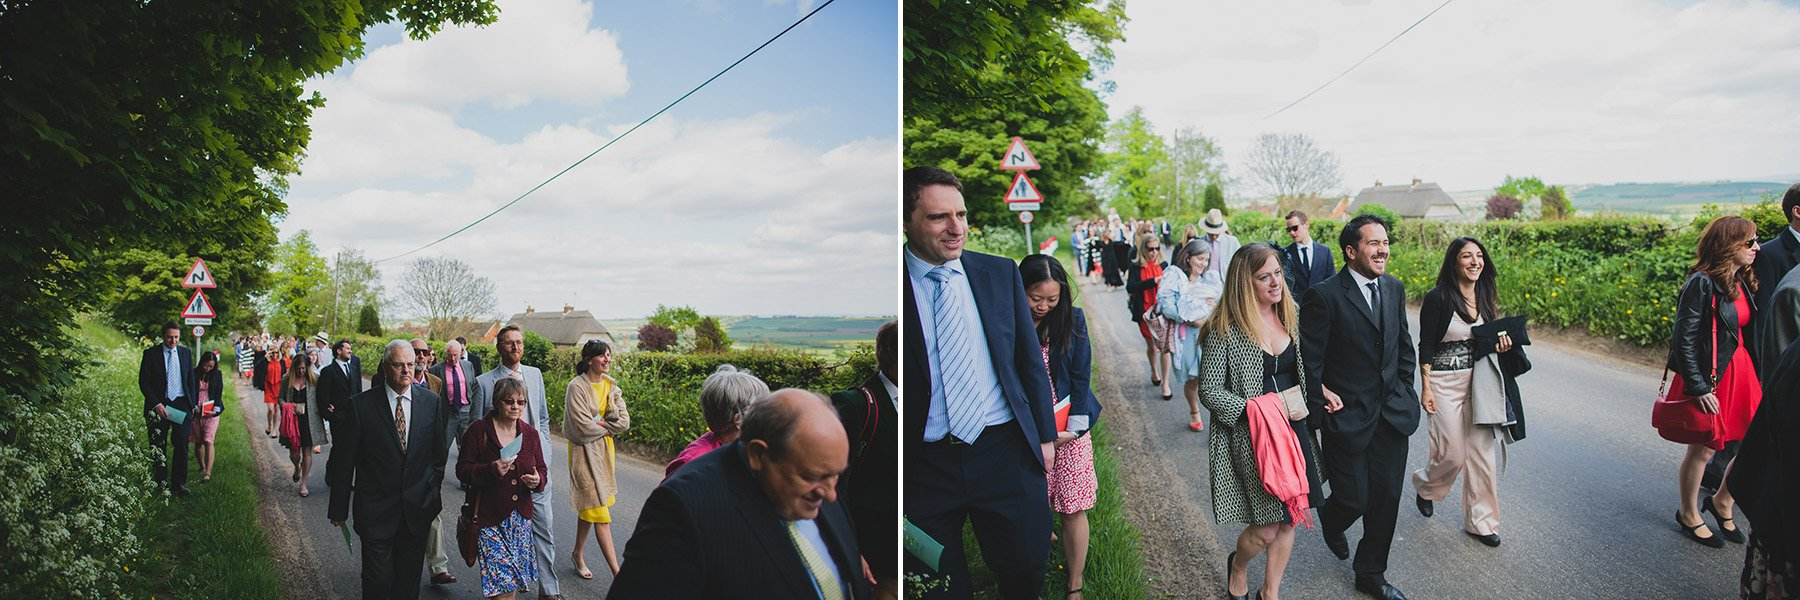 Buckinghamshire-Wedding-Lizzie-Duncan-087